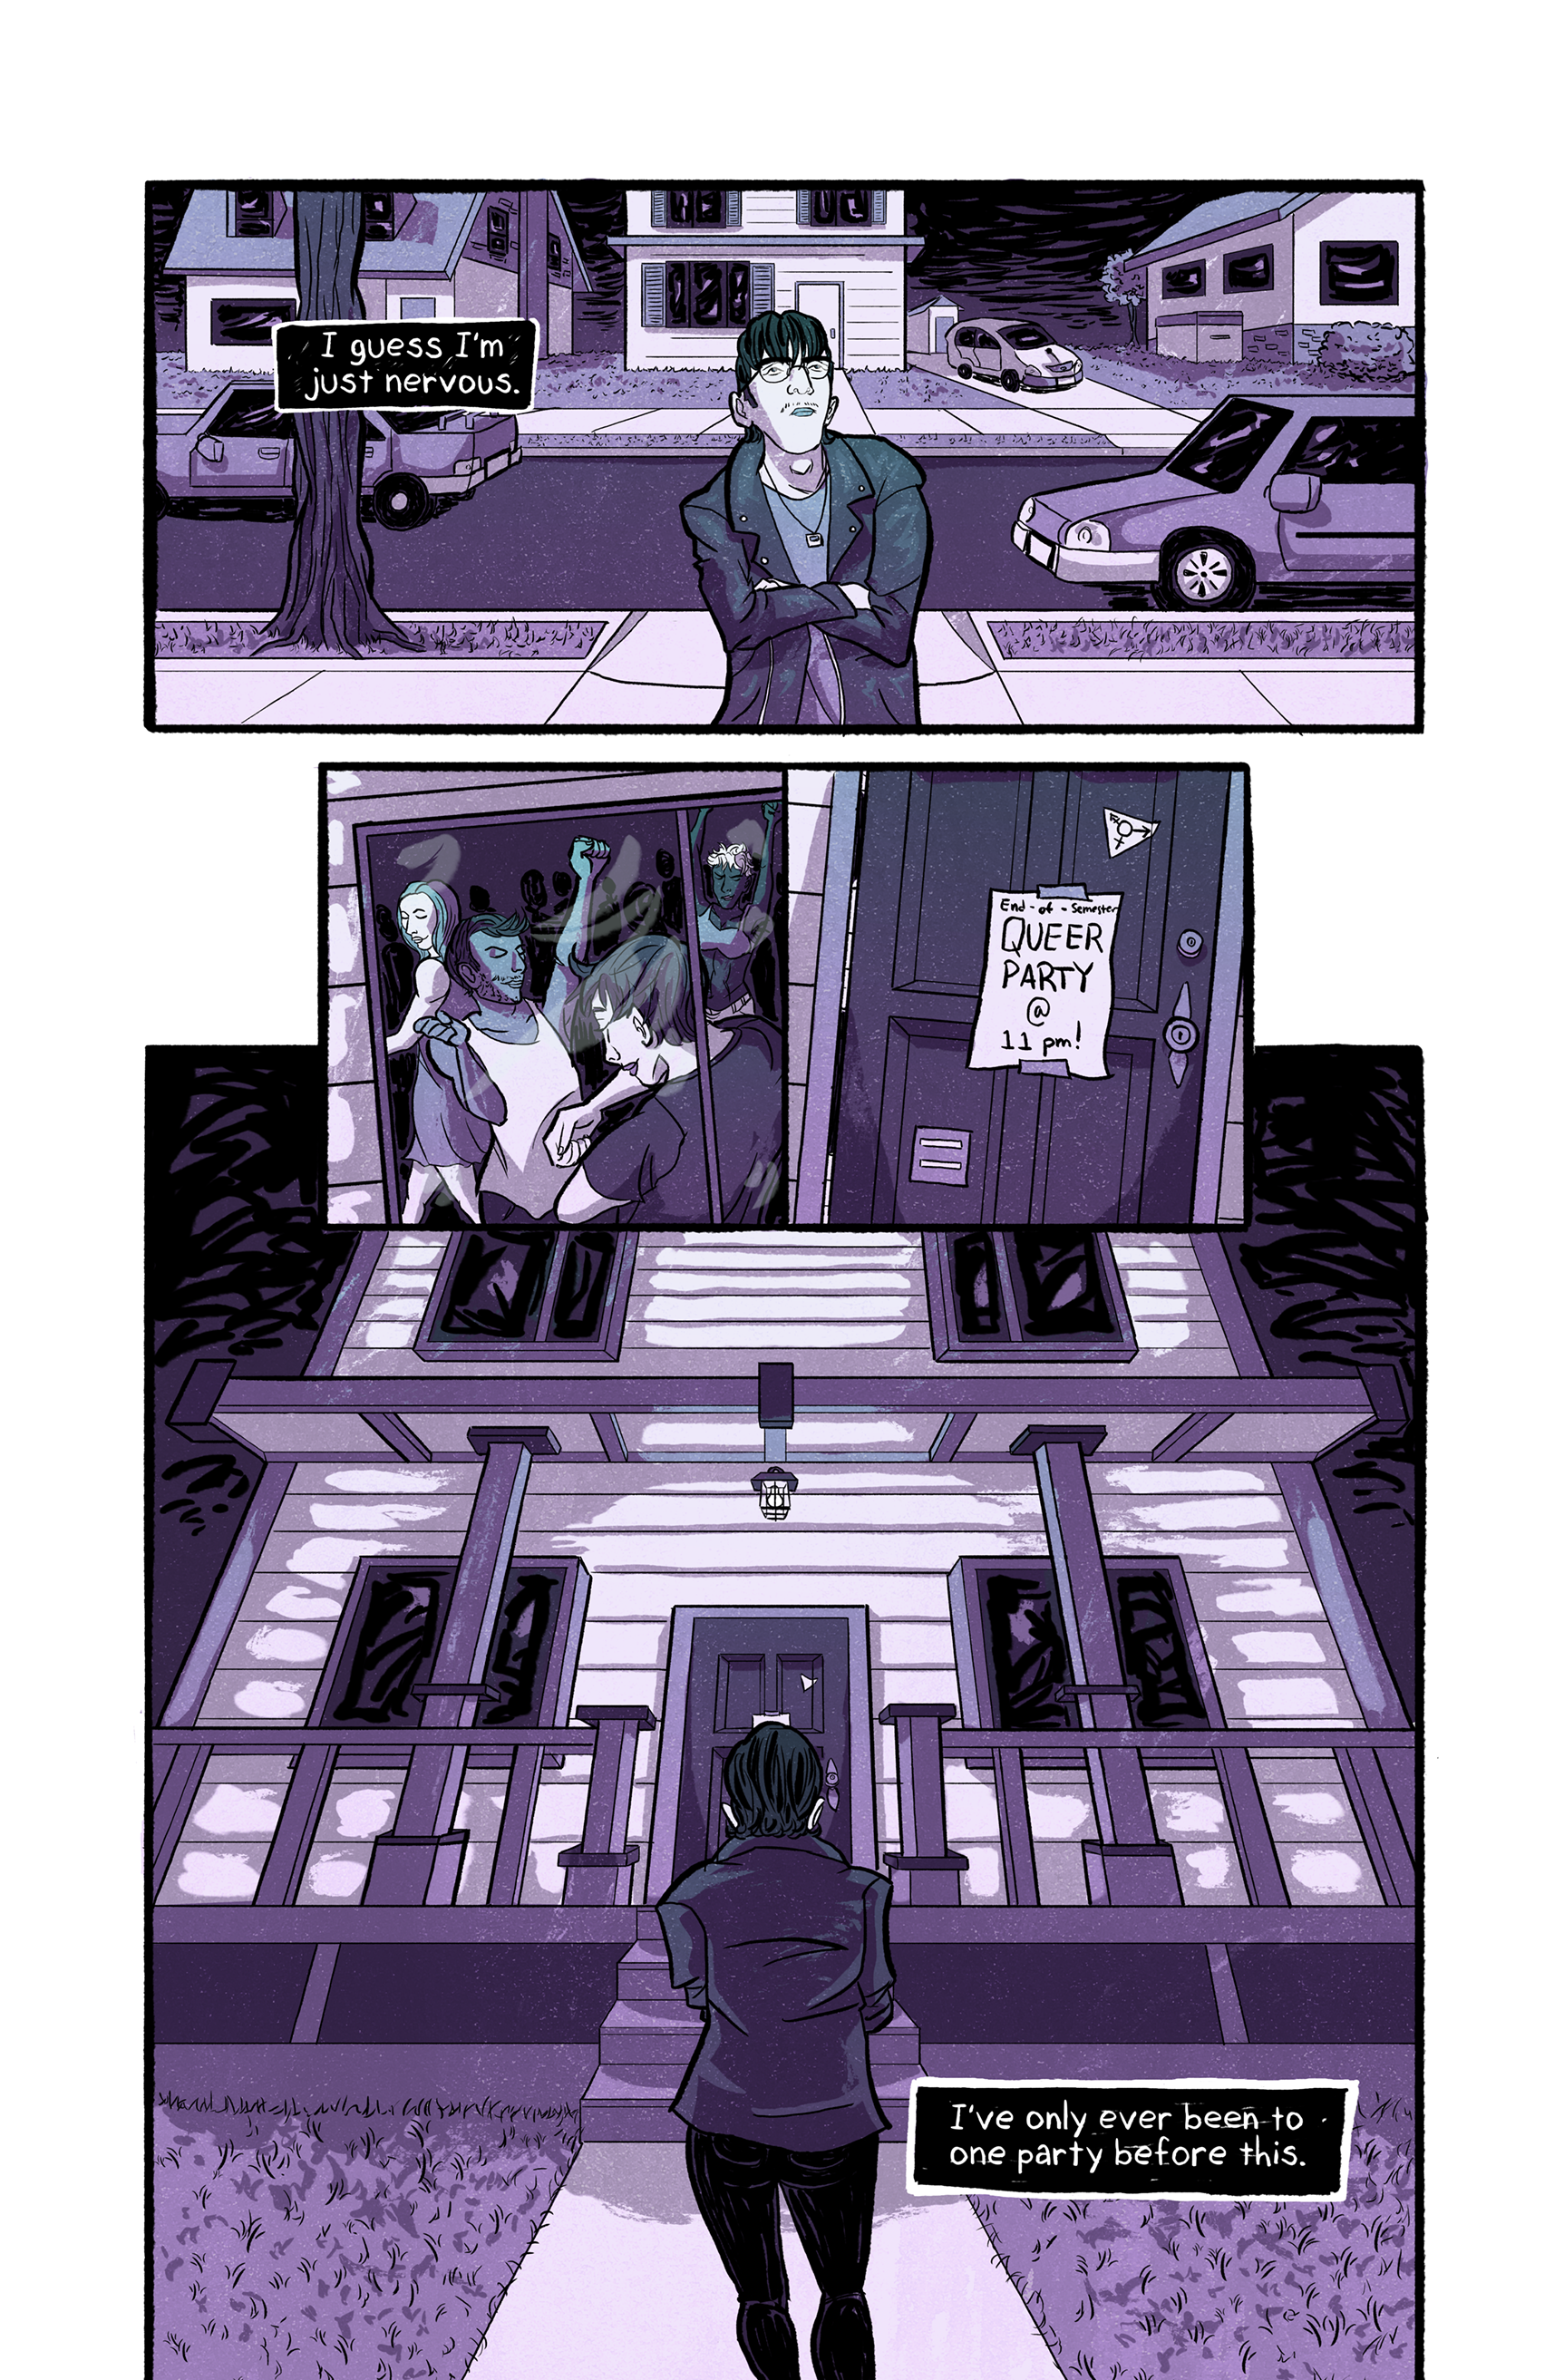 02untitled sad gay boy comic - page 01.png